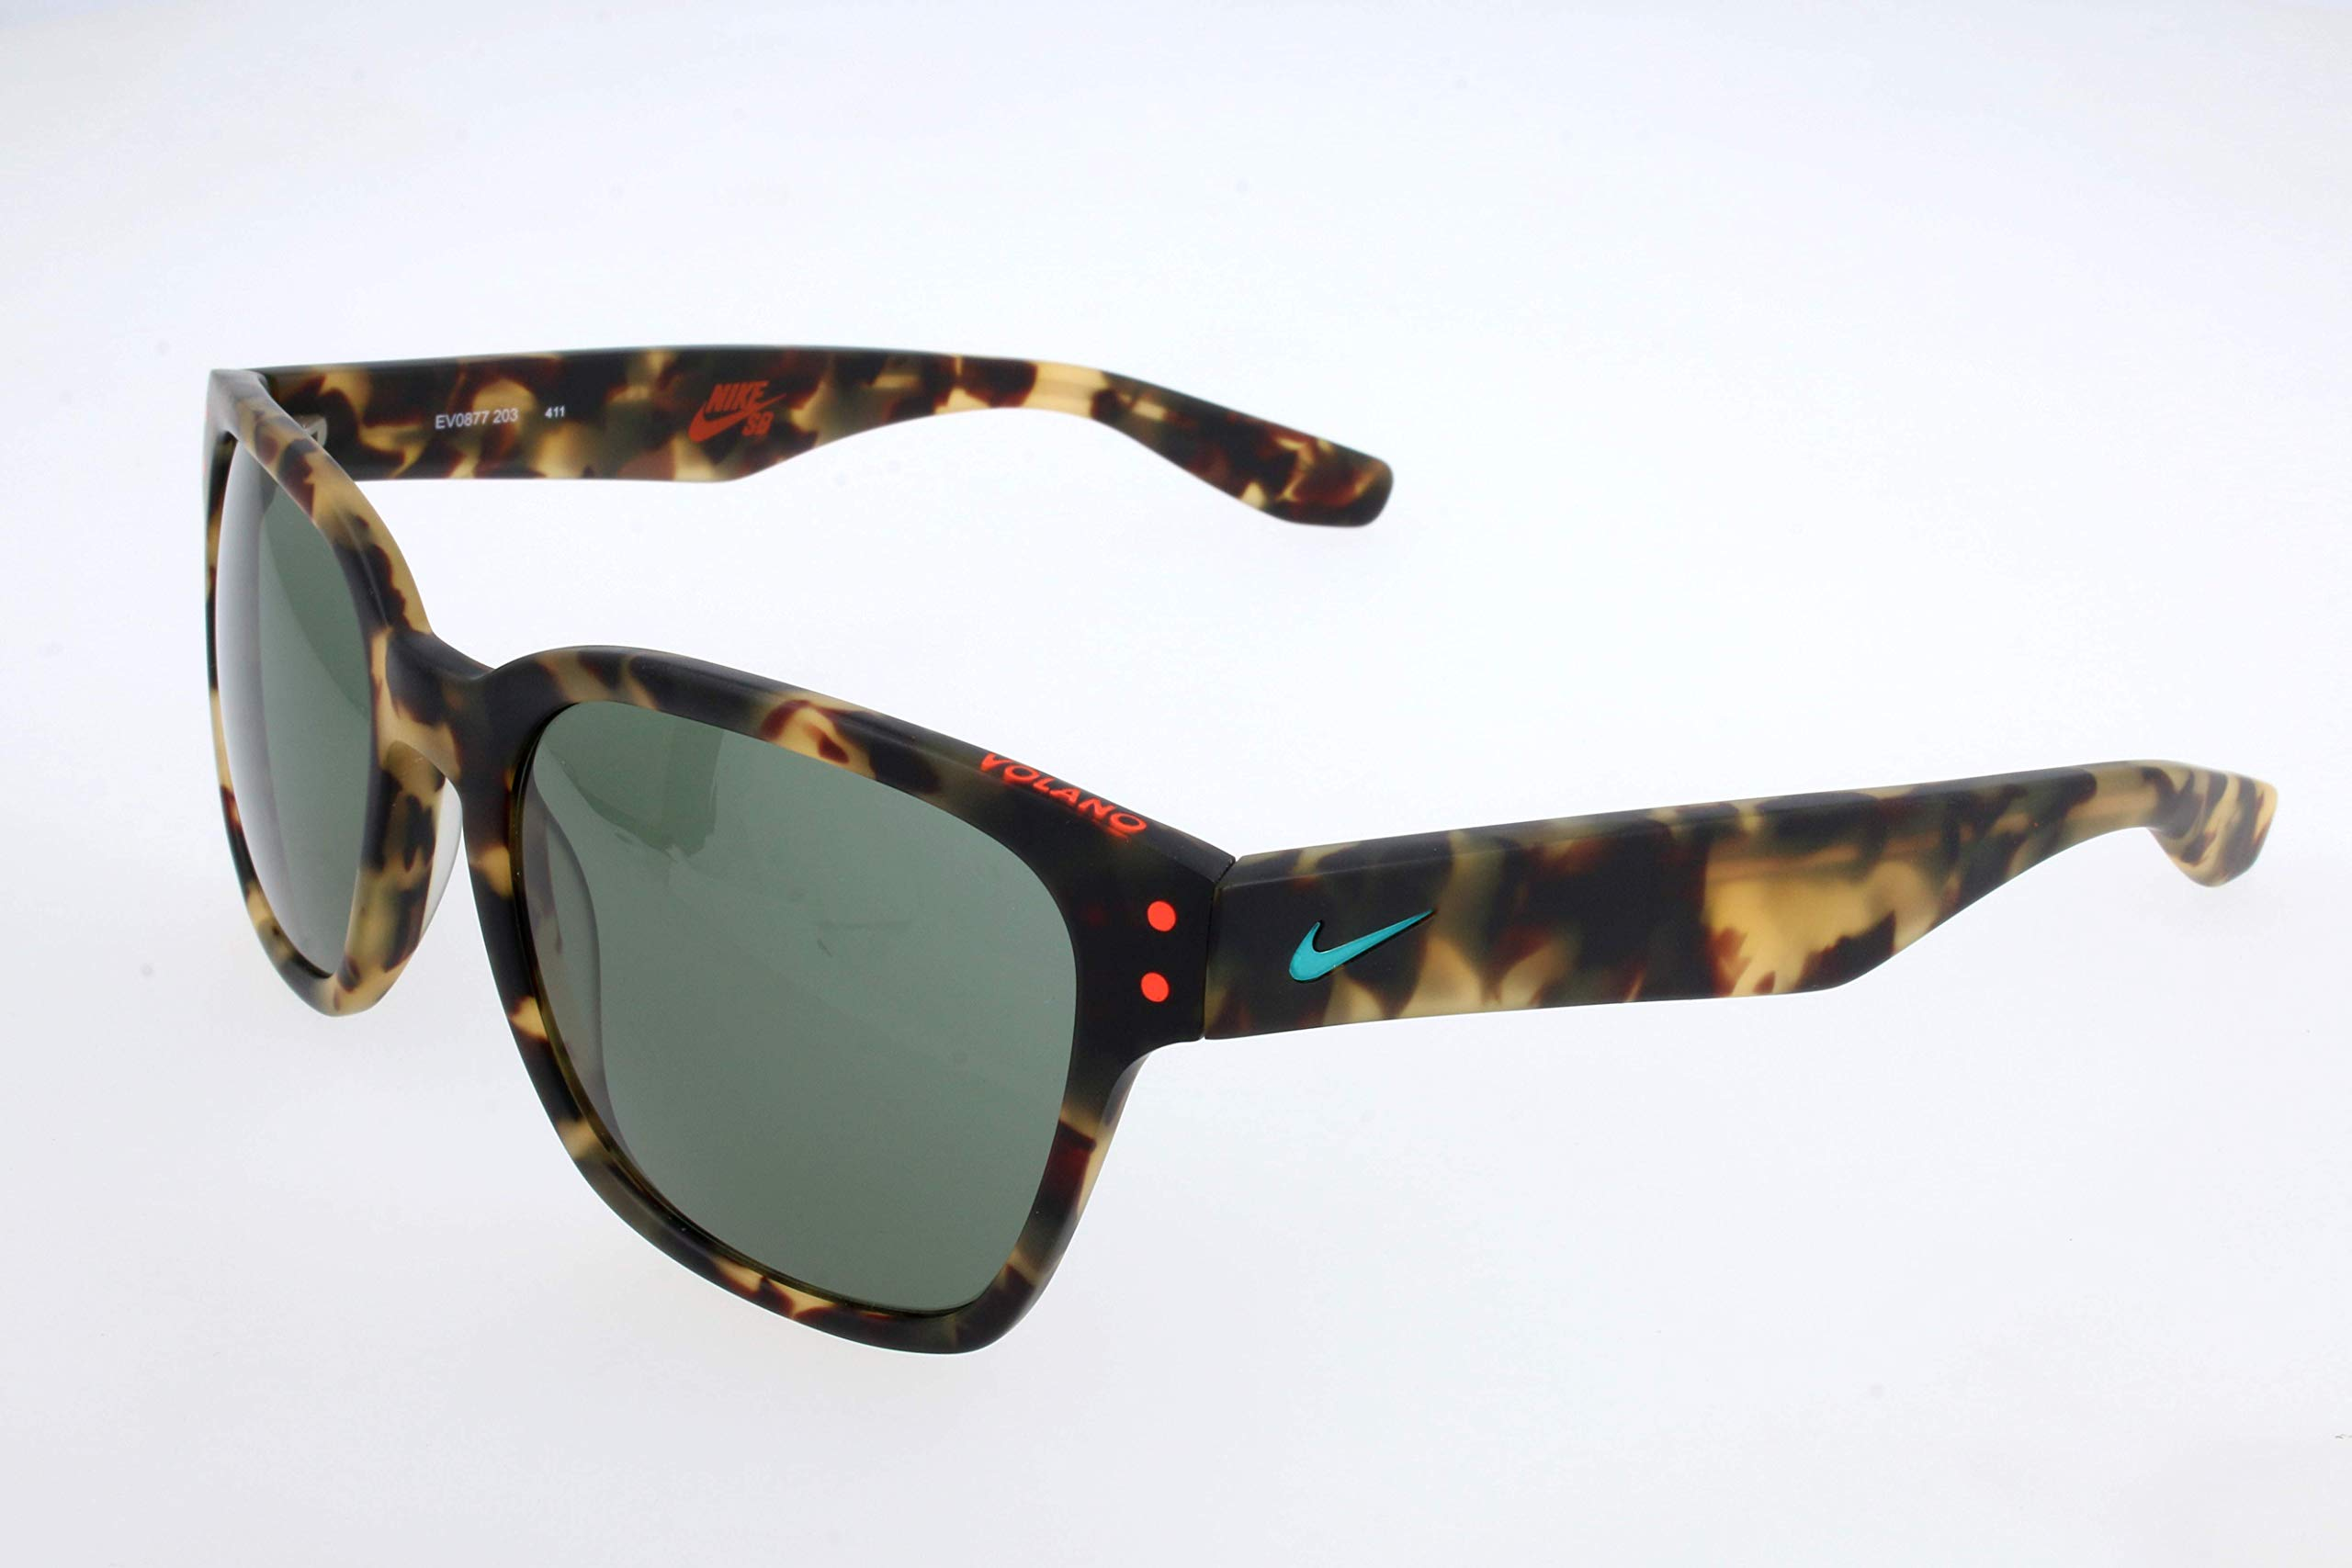 Nike EV0877-203 Volano Sunglasses (One Size), Matte Tokyo Tortoise/Hyper Jade, Teal Lens by Nike (Image #1)